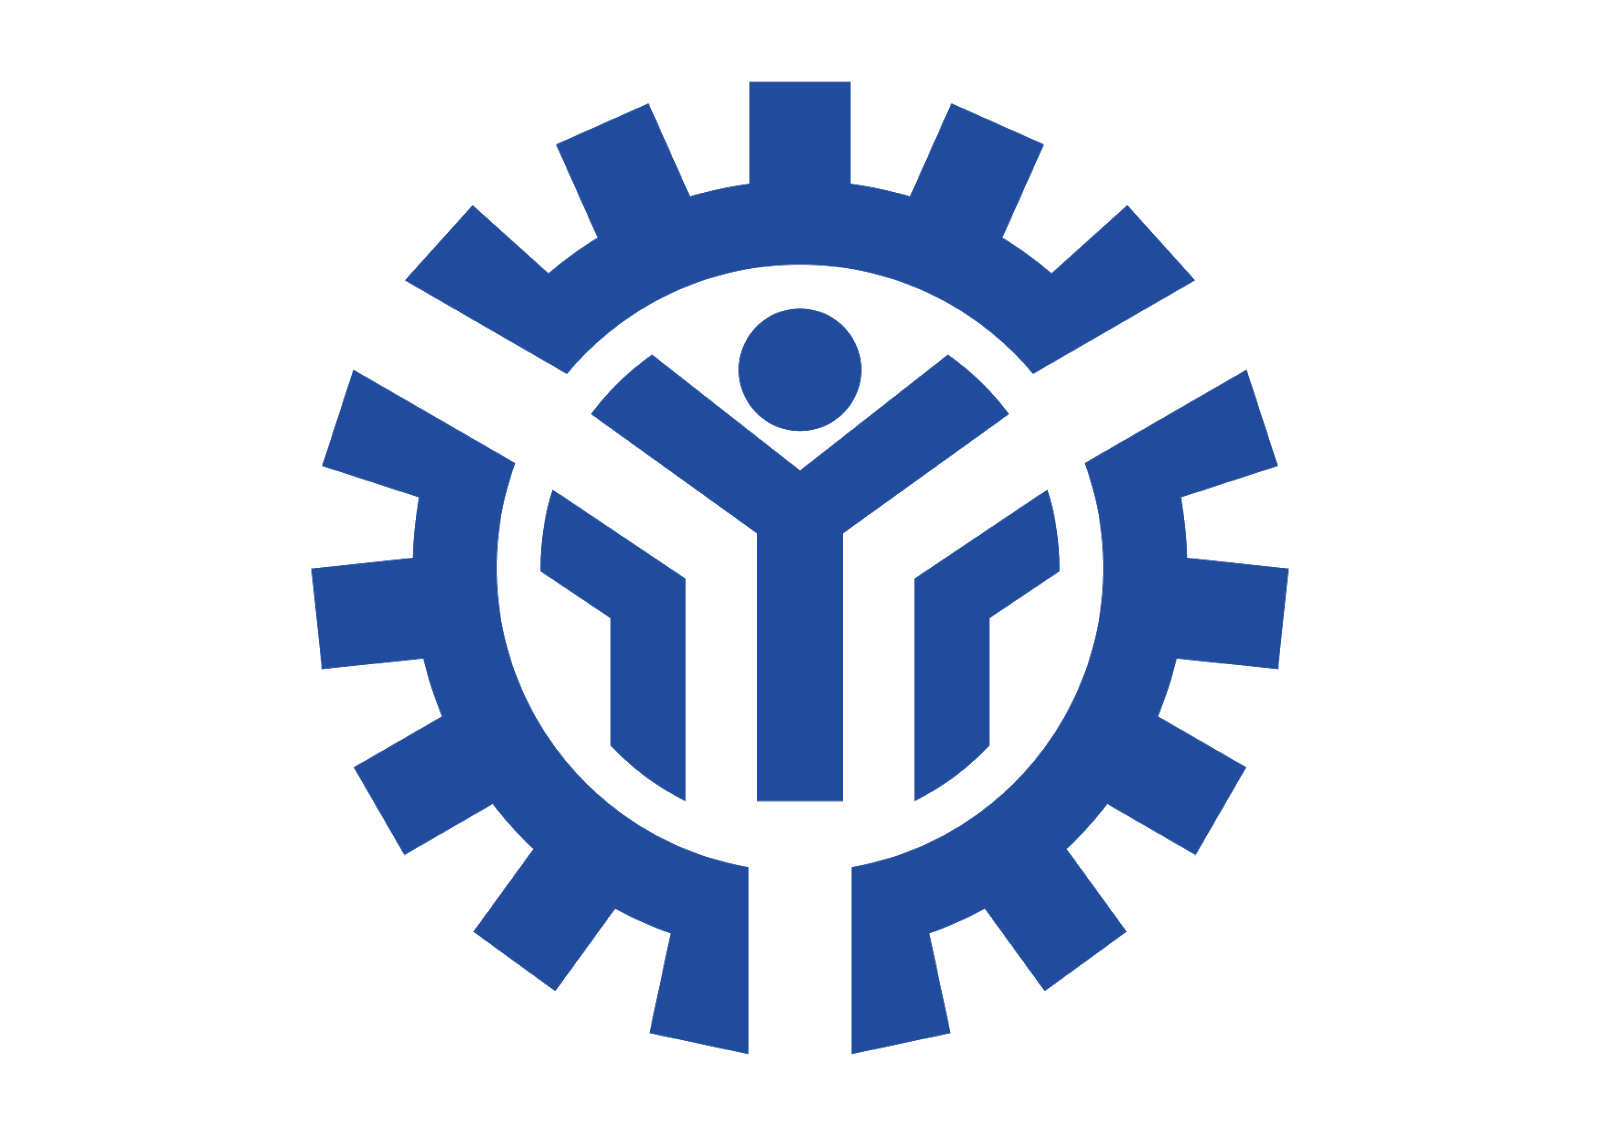 logo k3 vector png logo keren logo keren blogger